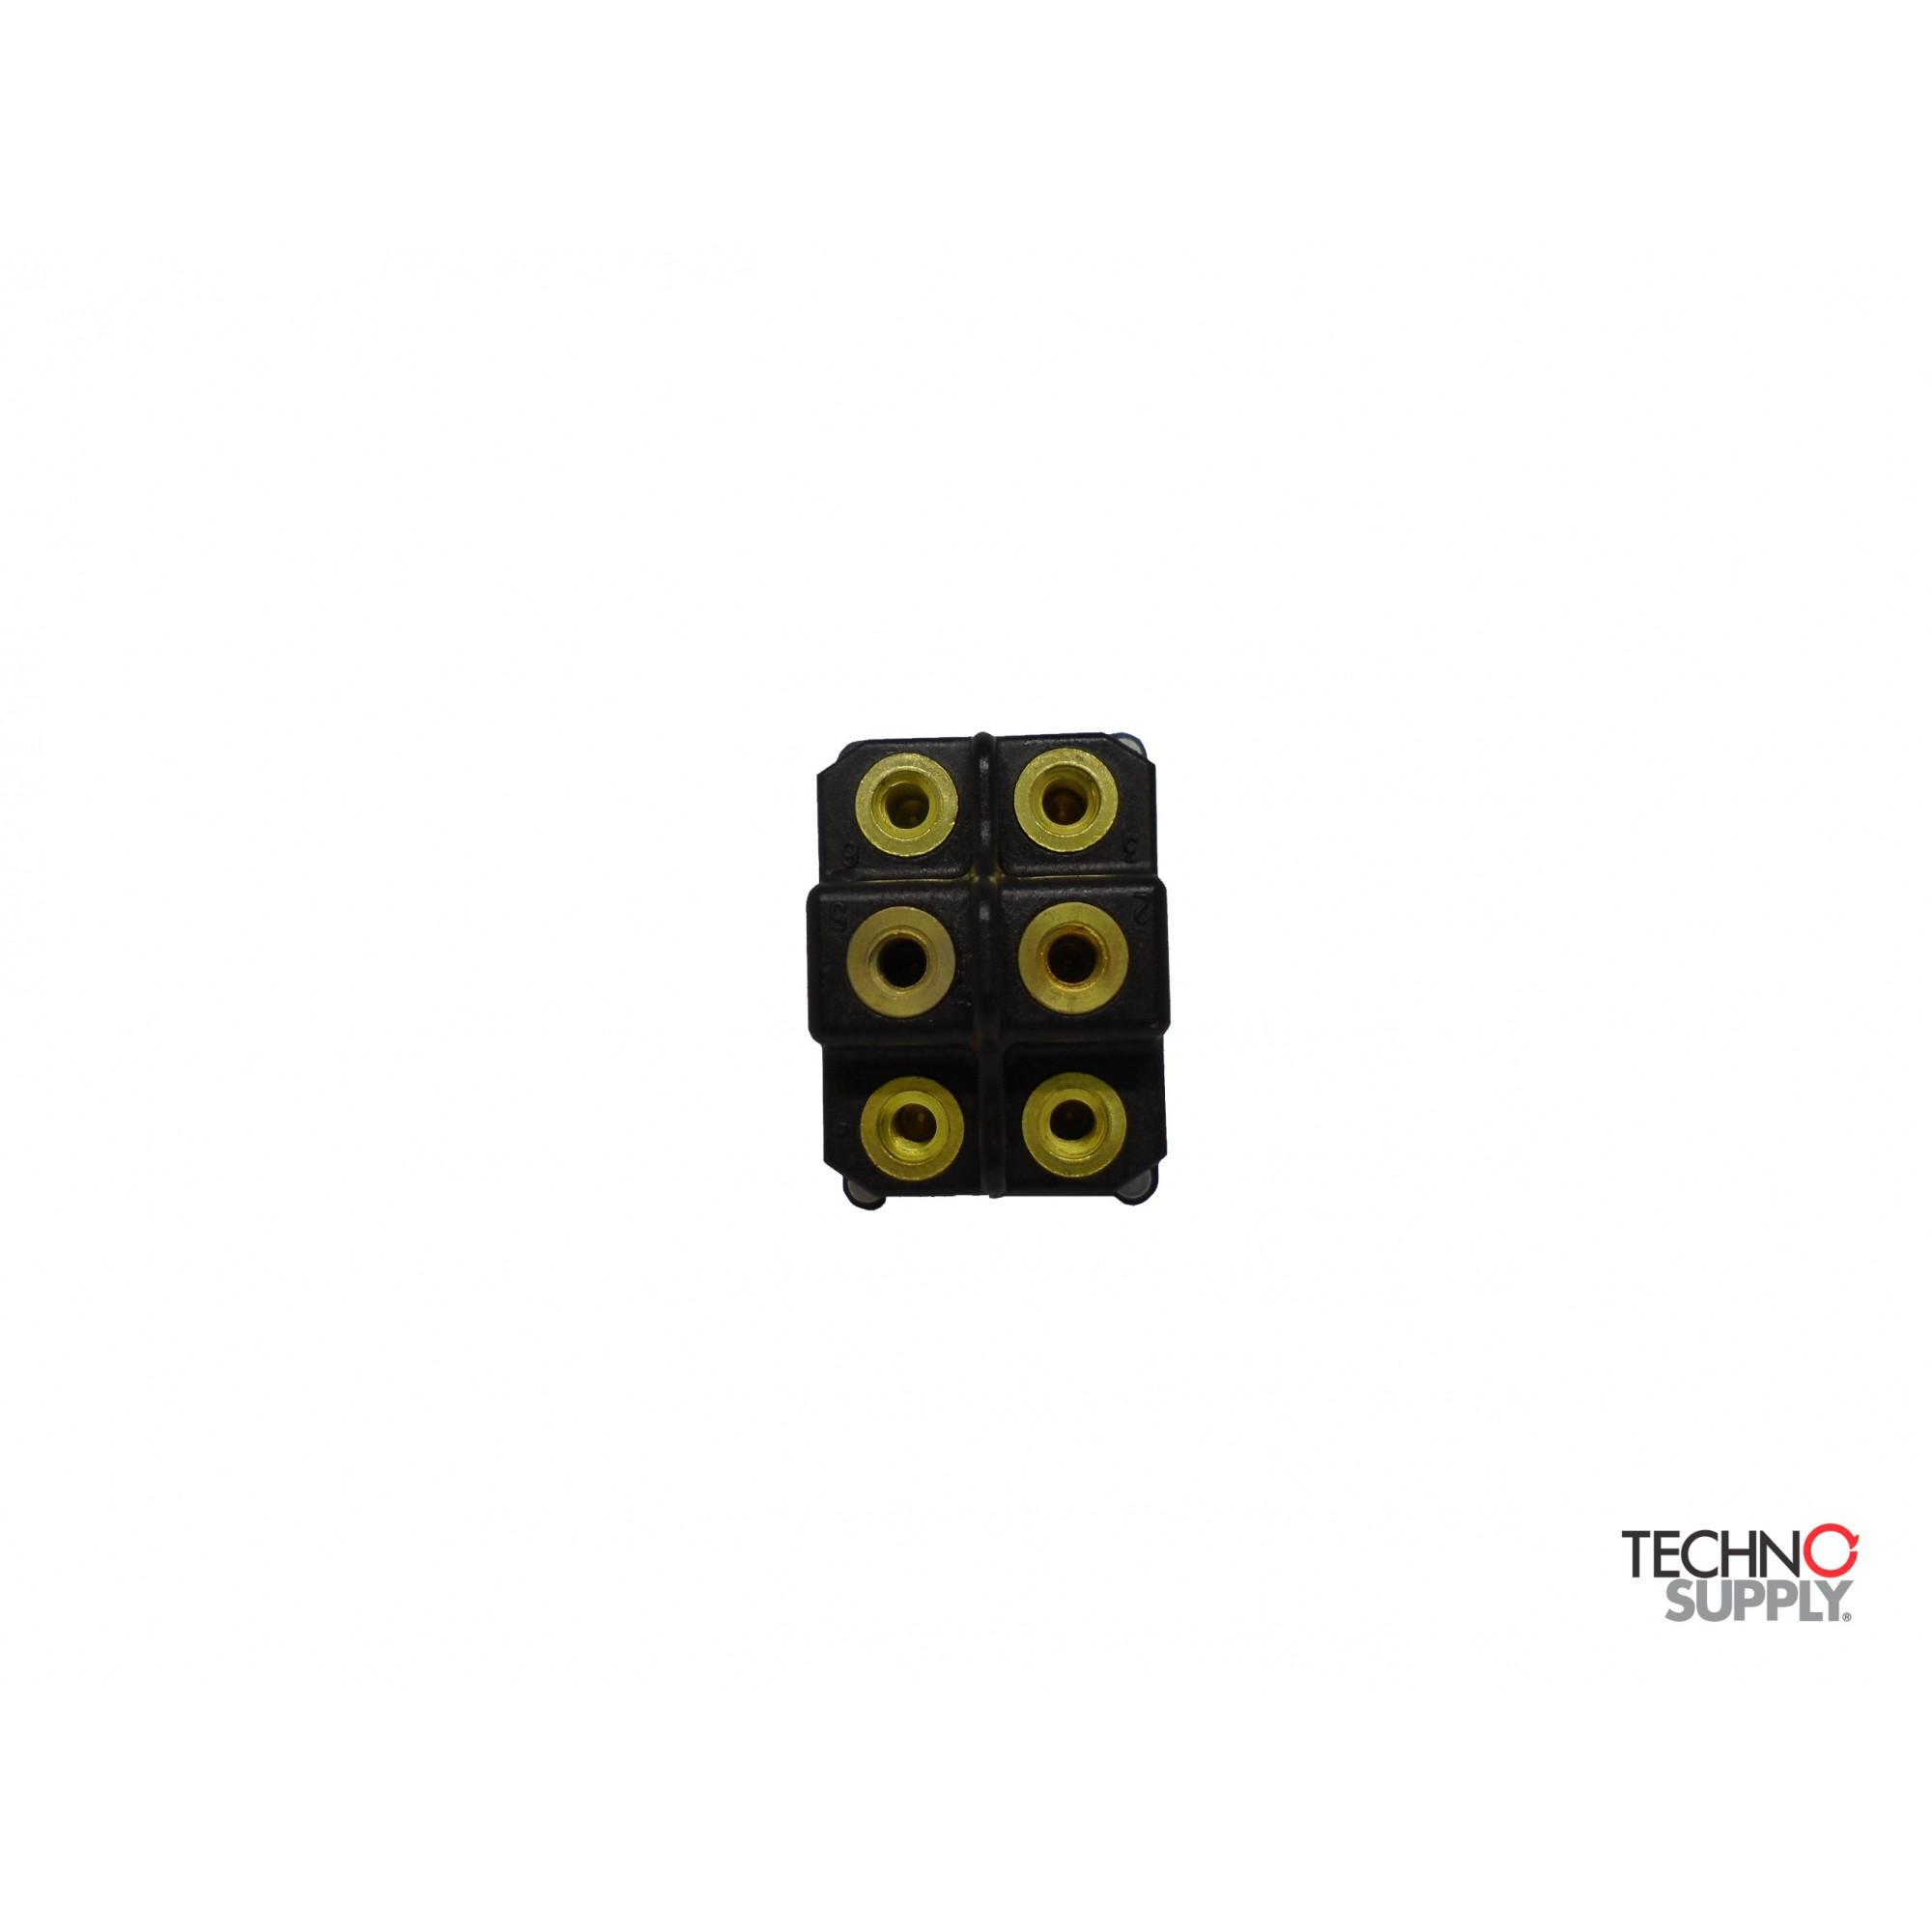 Interruptor Profissional 3 Posições Honeywell 62nt1-7-nh